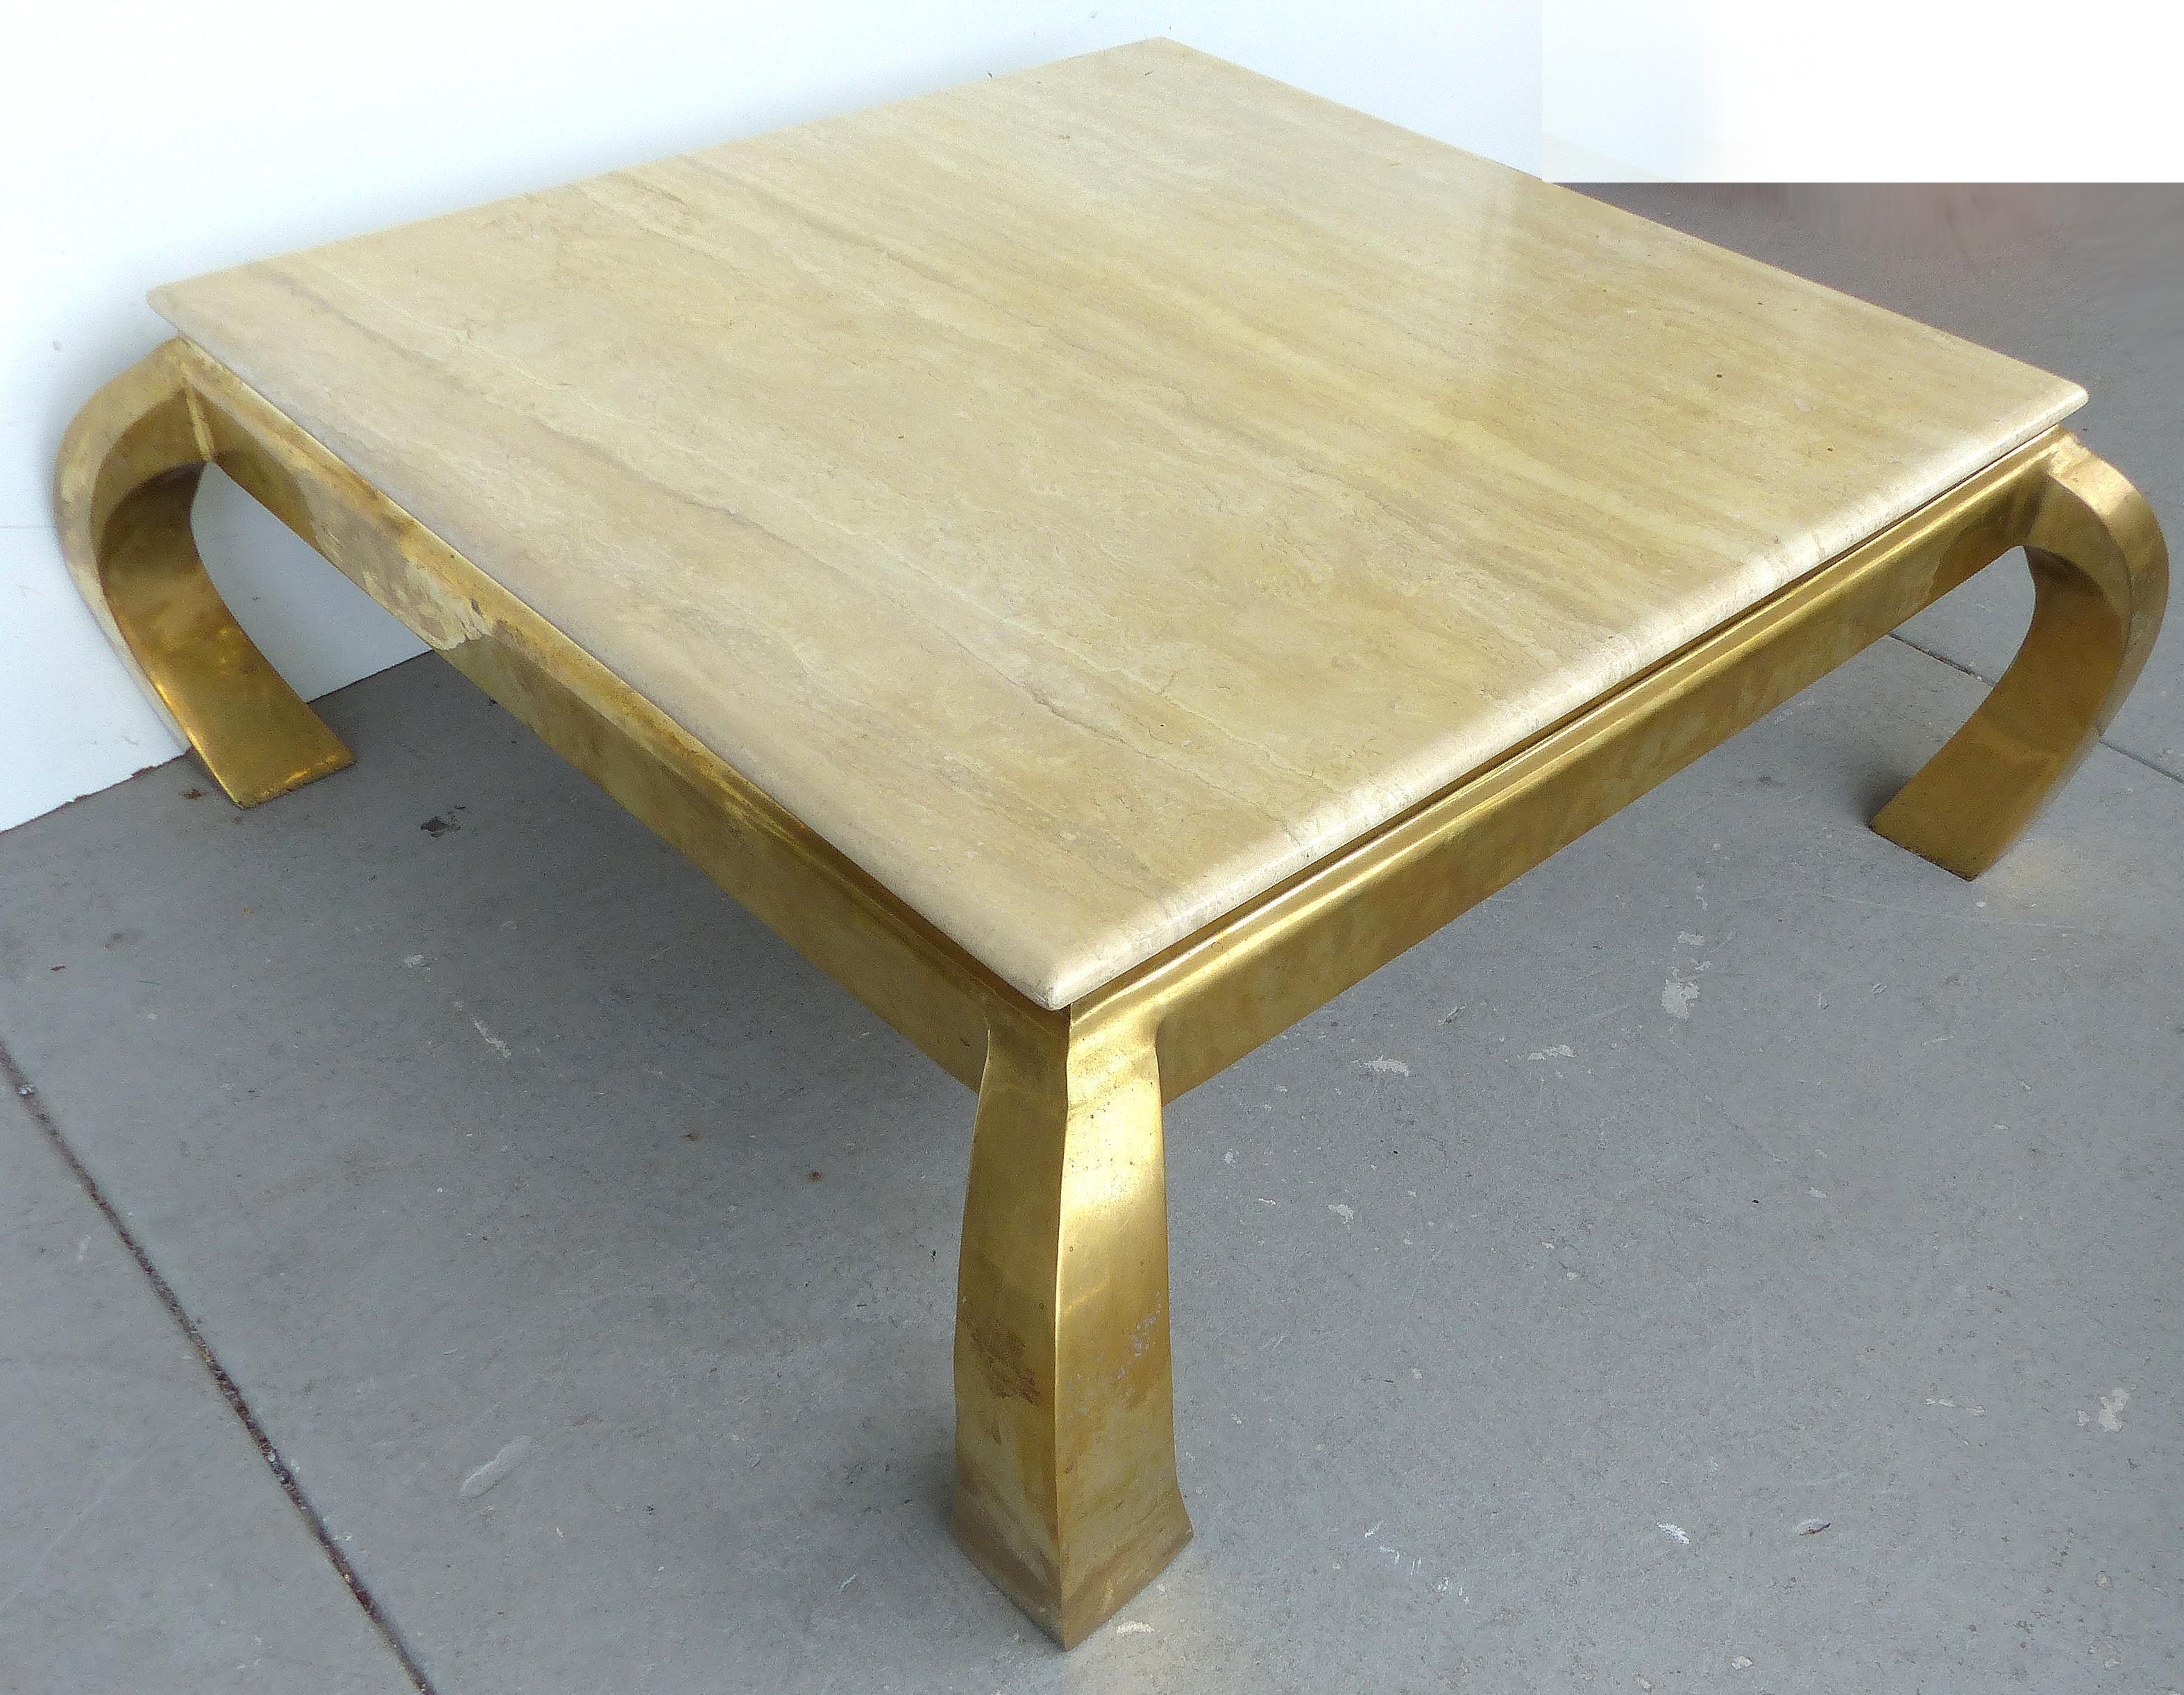 MidCentury Springer Style Brass Travertine Coffee Table Chairish